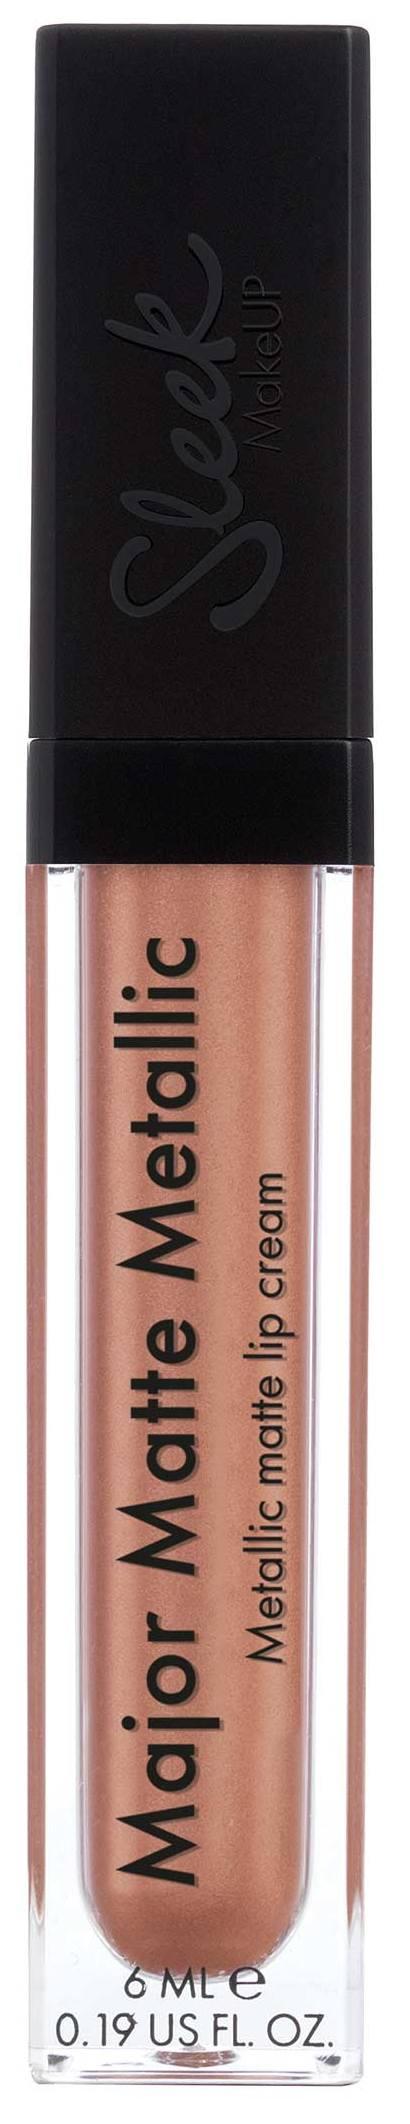 SLEEK MakeUP Блеск для губ 1175 / Copperplate MATTE ME METALLIC - Блески для губ